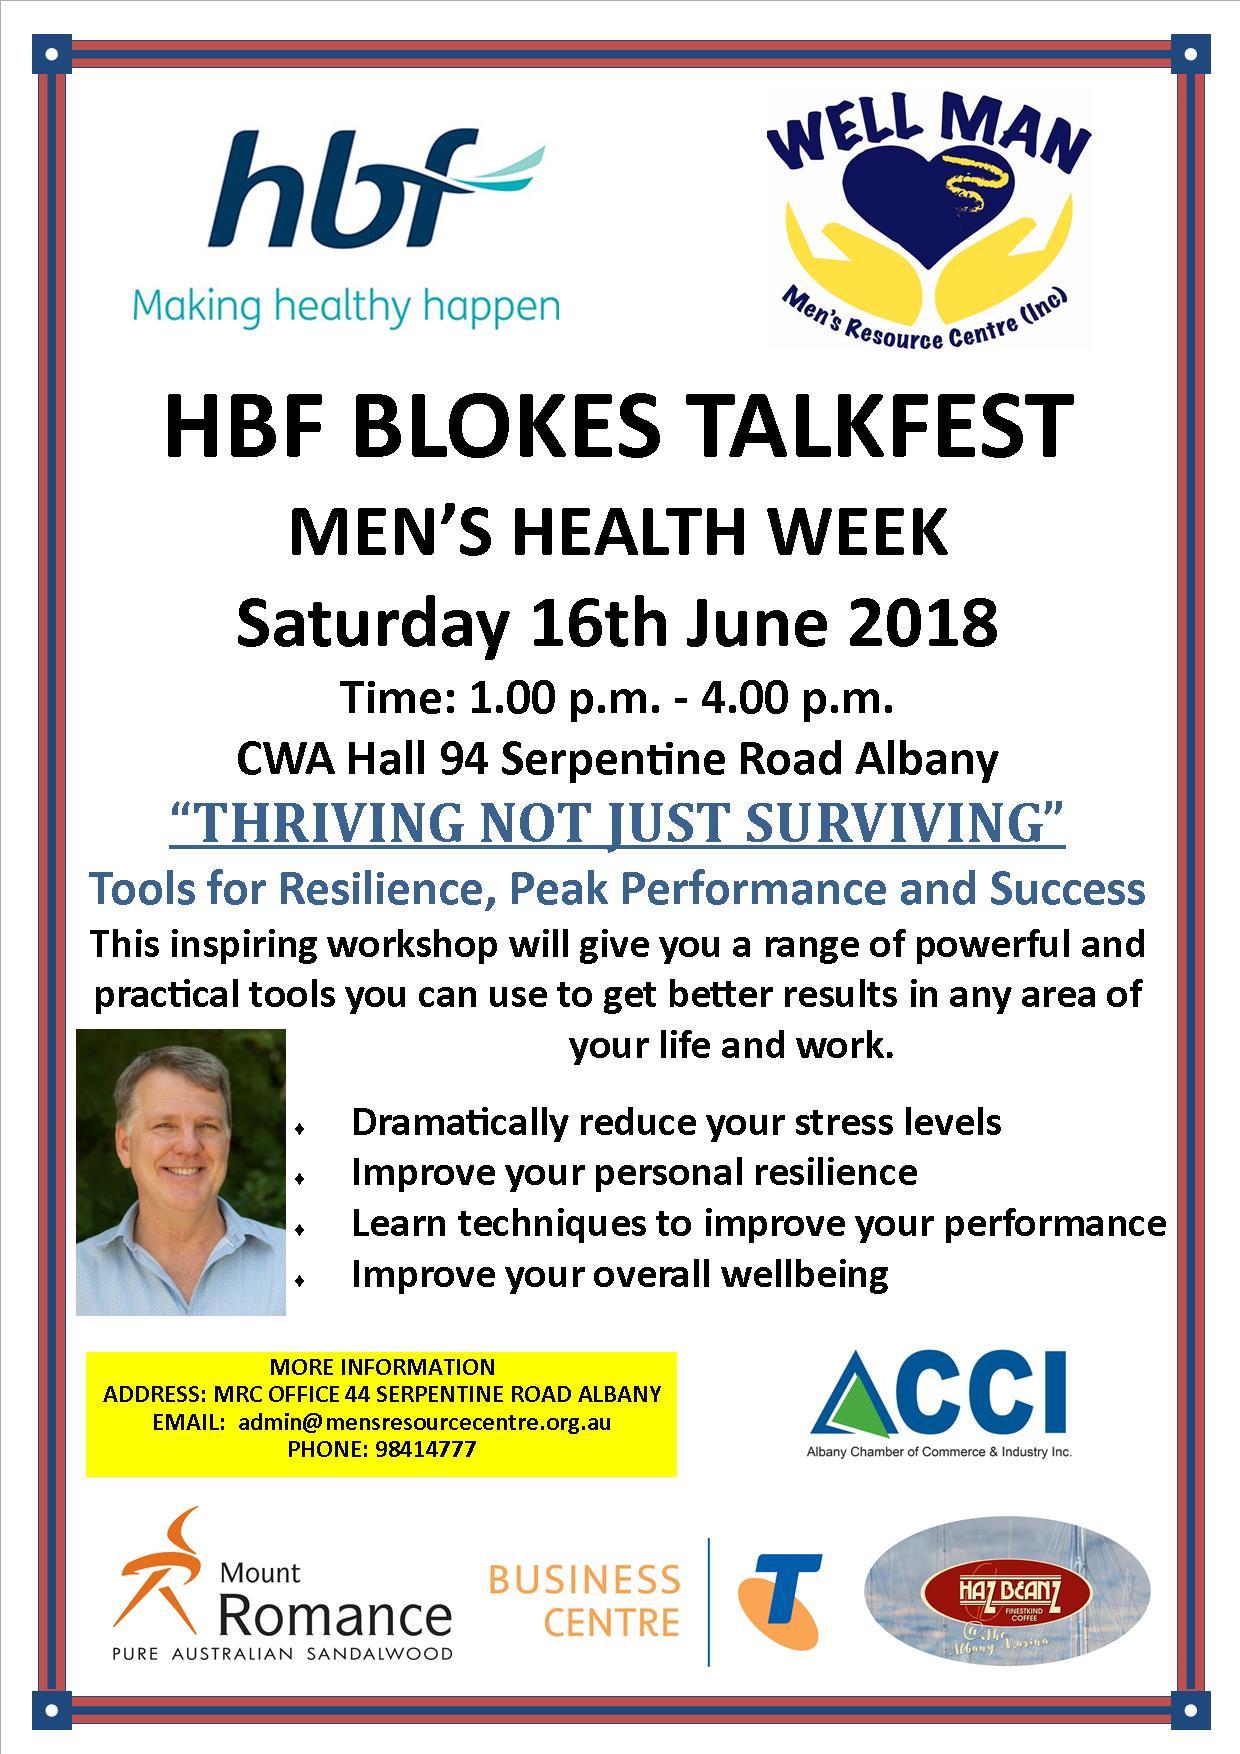 Men's Health Week 2018 jpeg.jpg